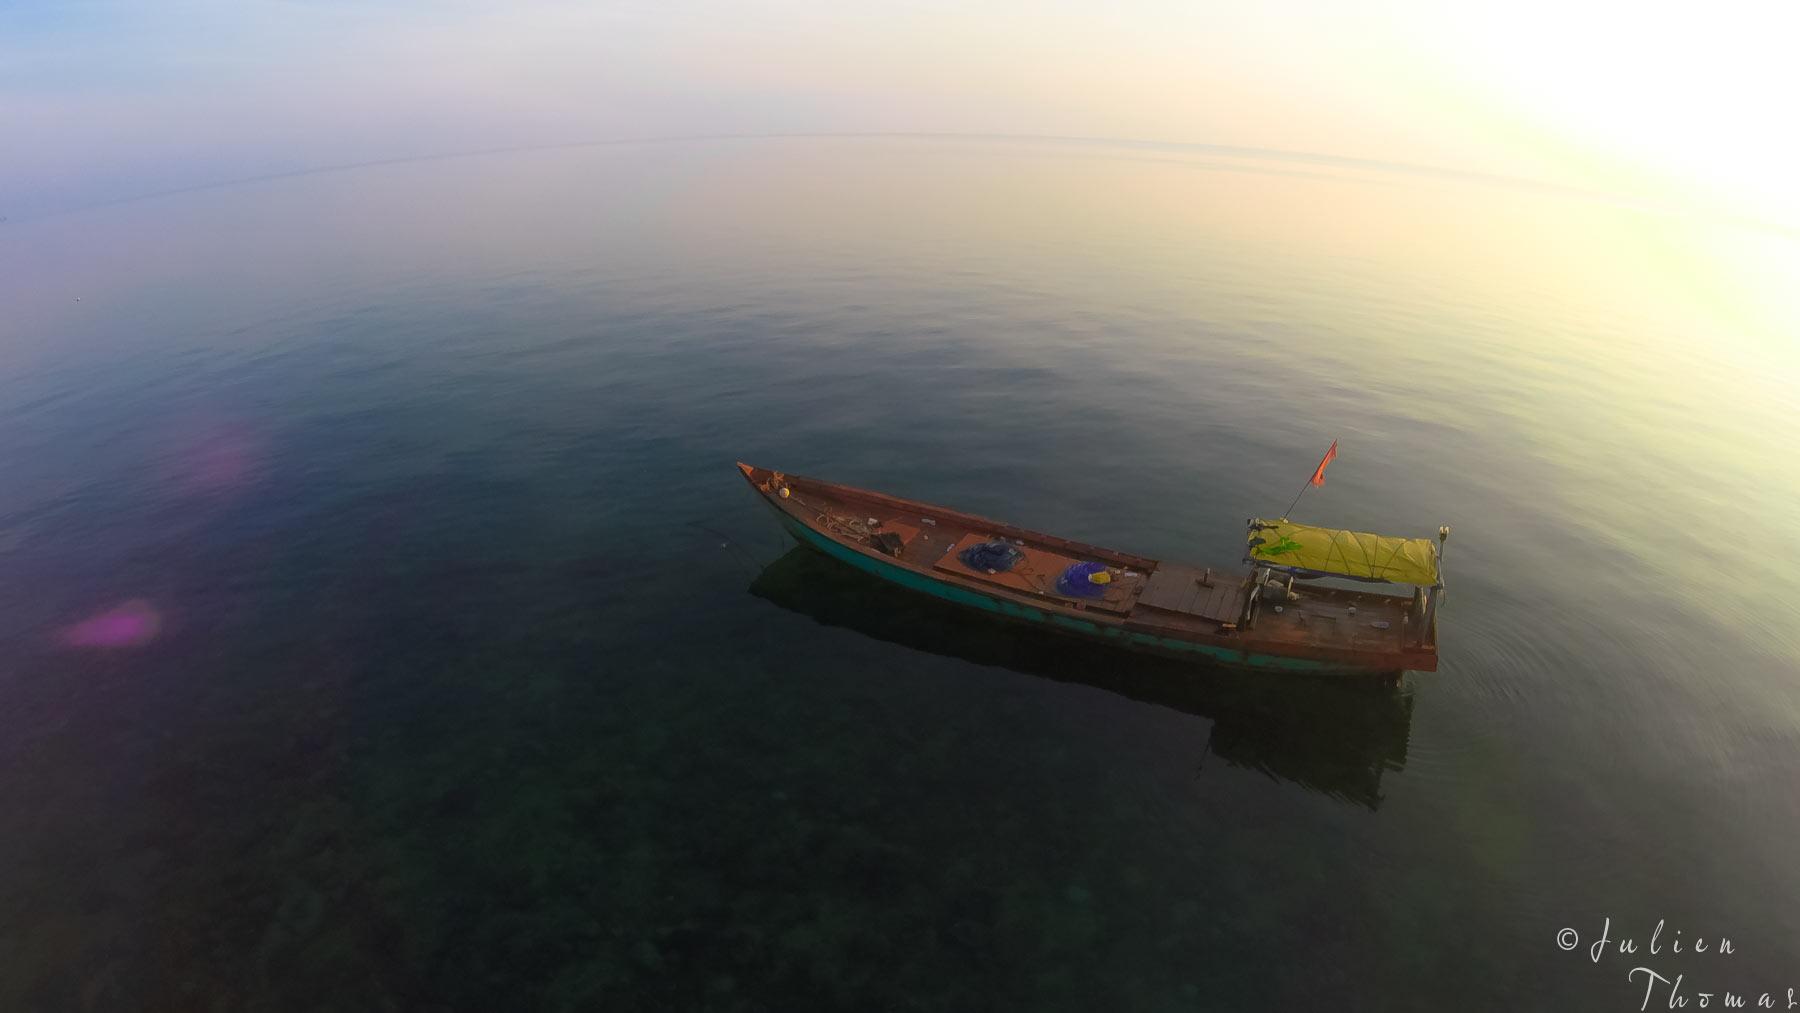 2016 – Vietnam, Phu Quoc Island